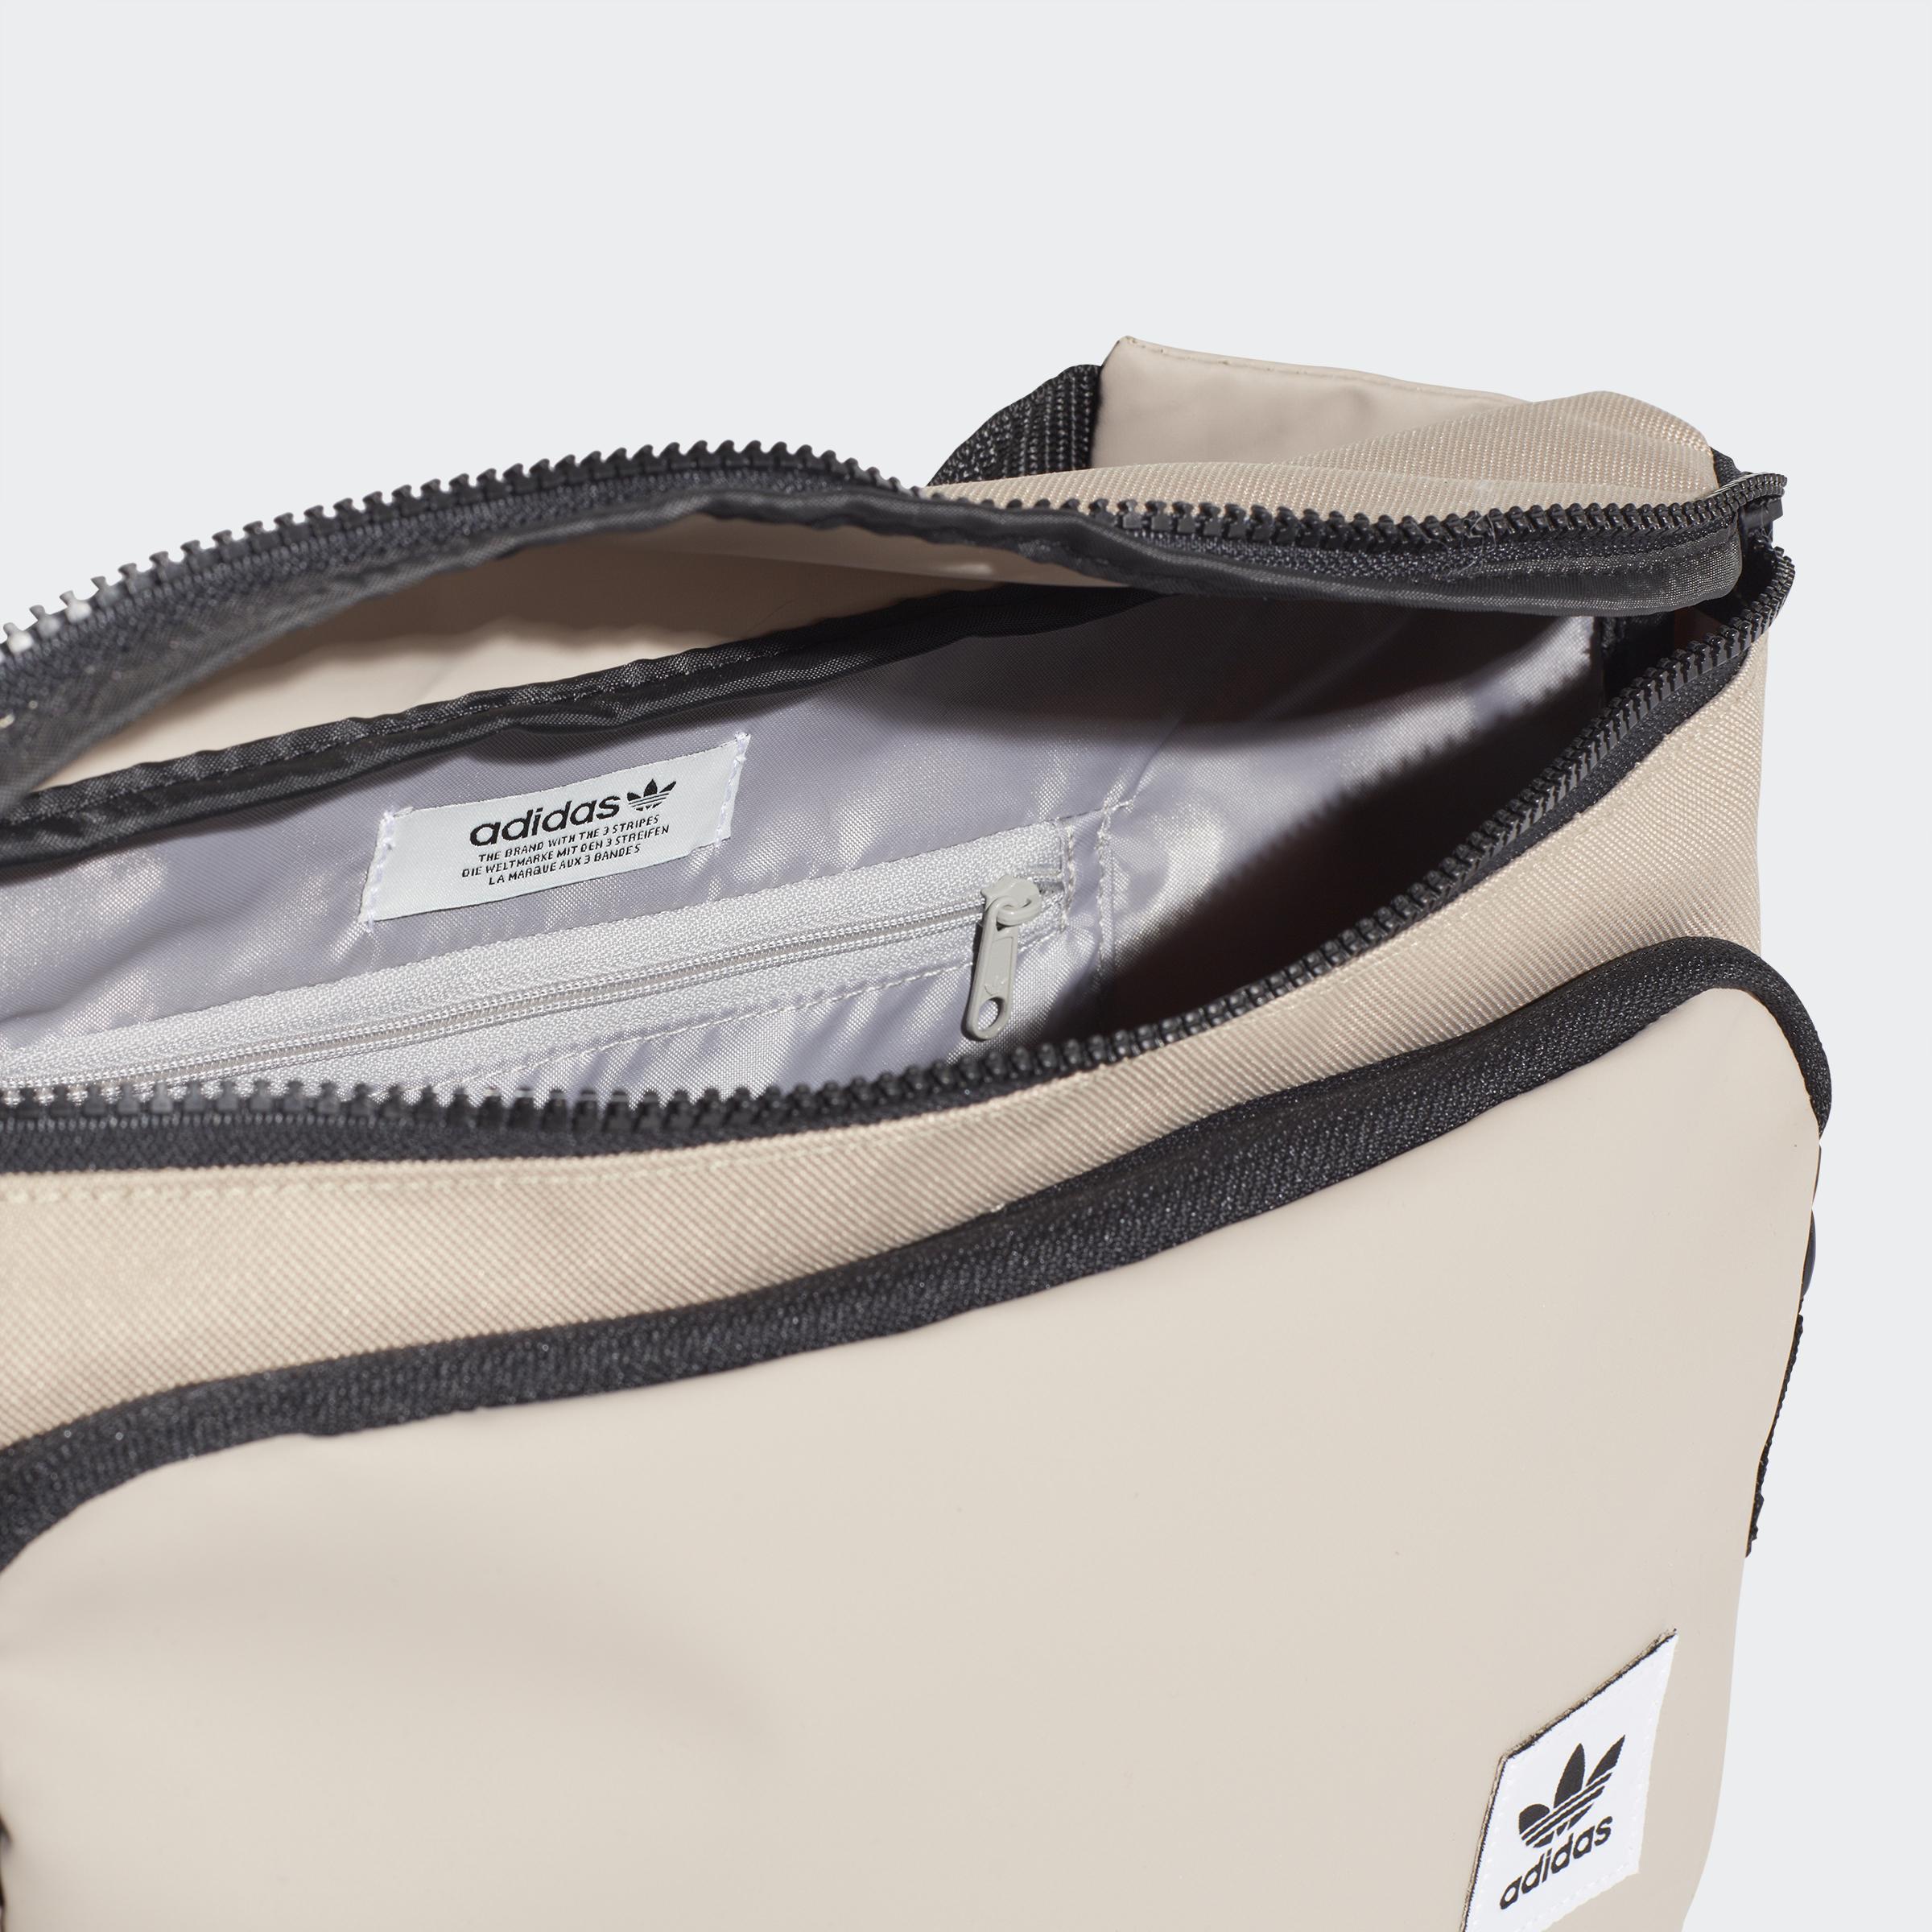 adidas-Premium-Essentials-Waist-Bag-Large-Bags thumbnail 12